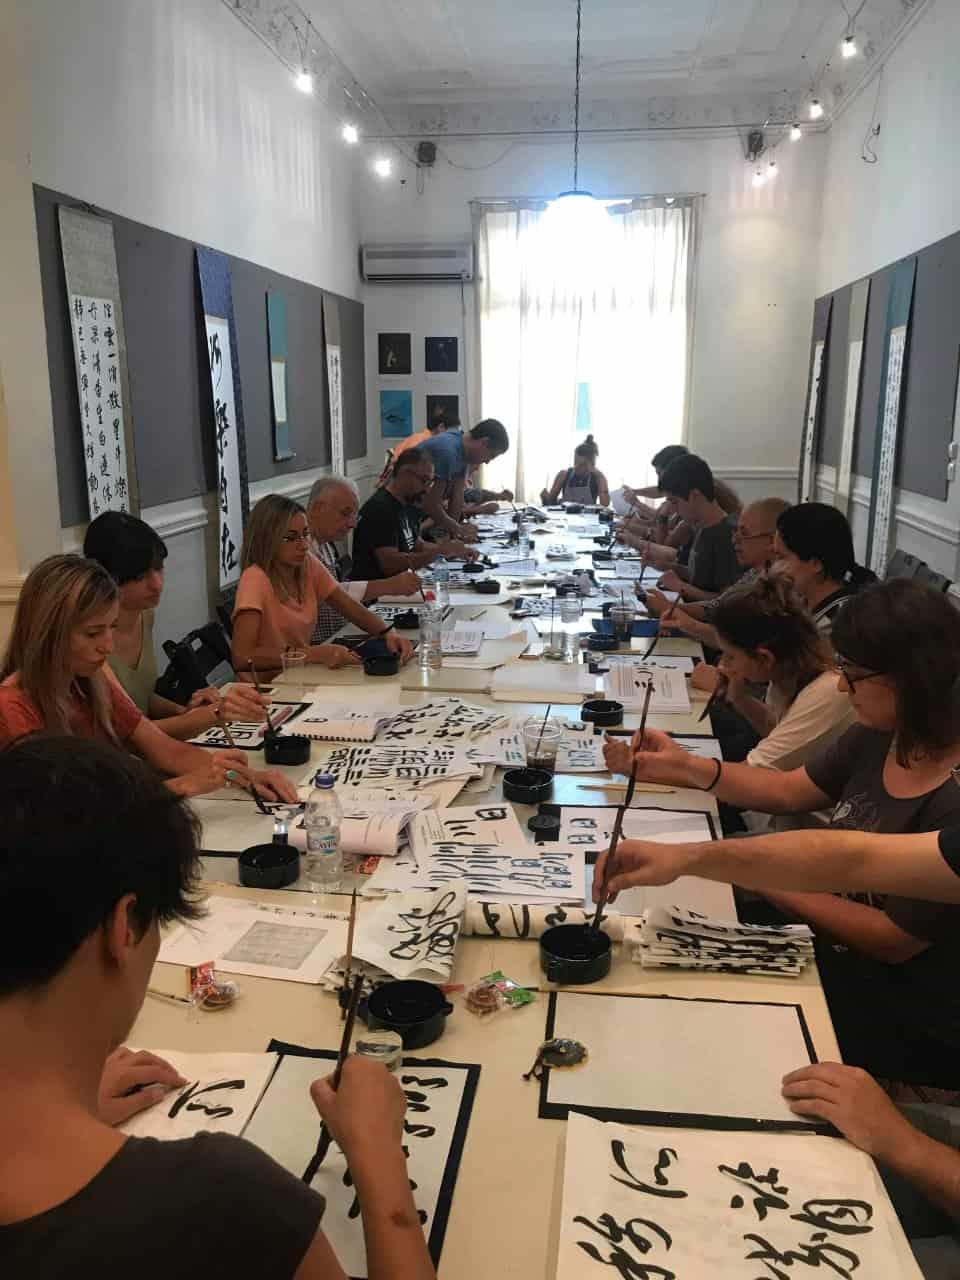 20190916010715 p - ギリシャでの書道教室 Calligraphy workshop in Greece